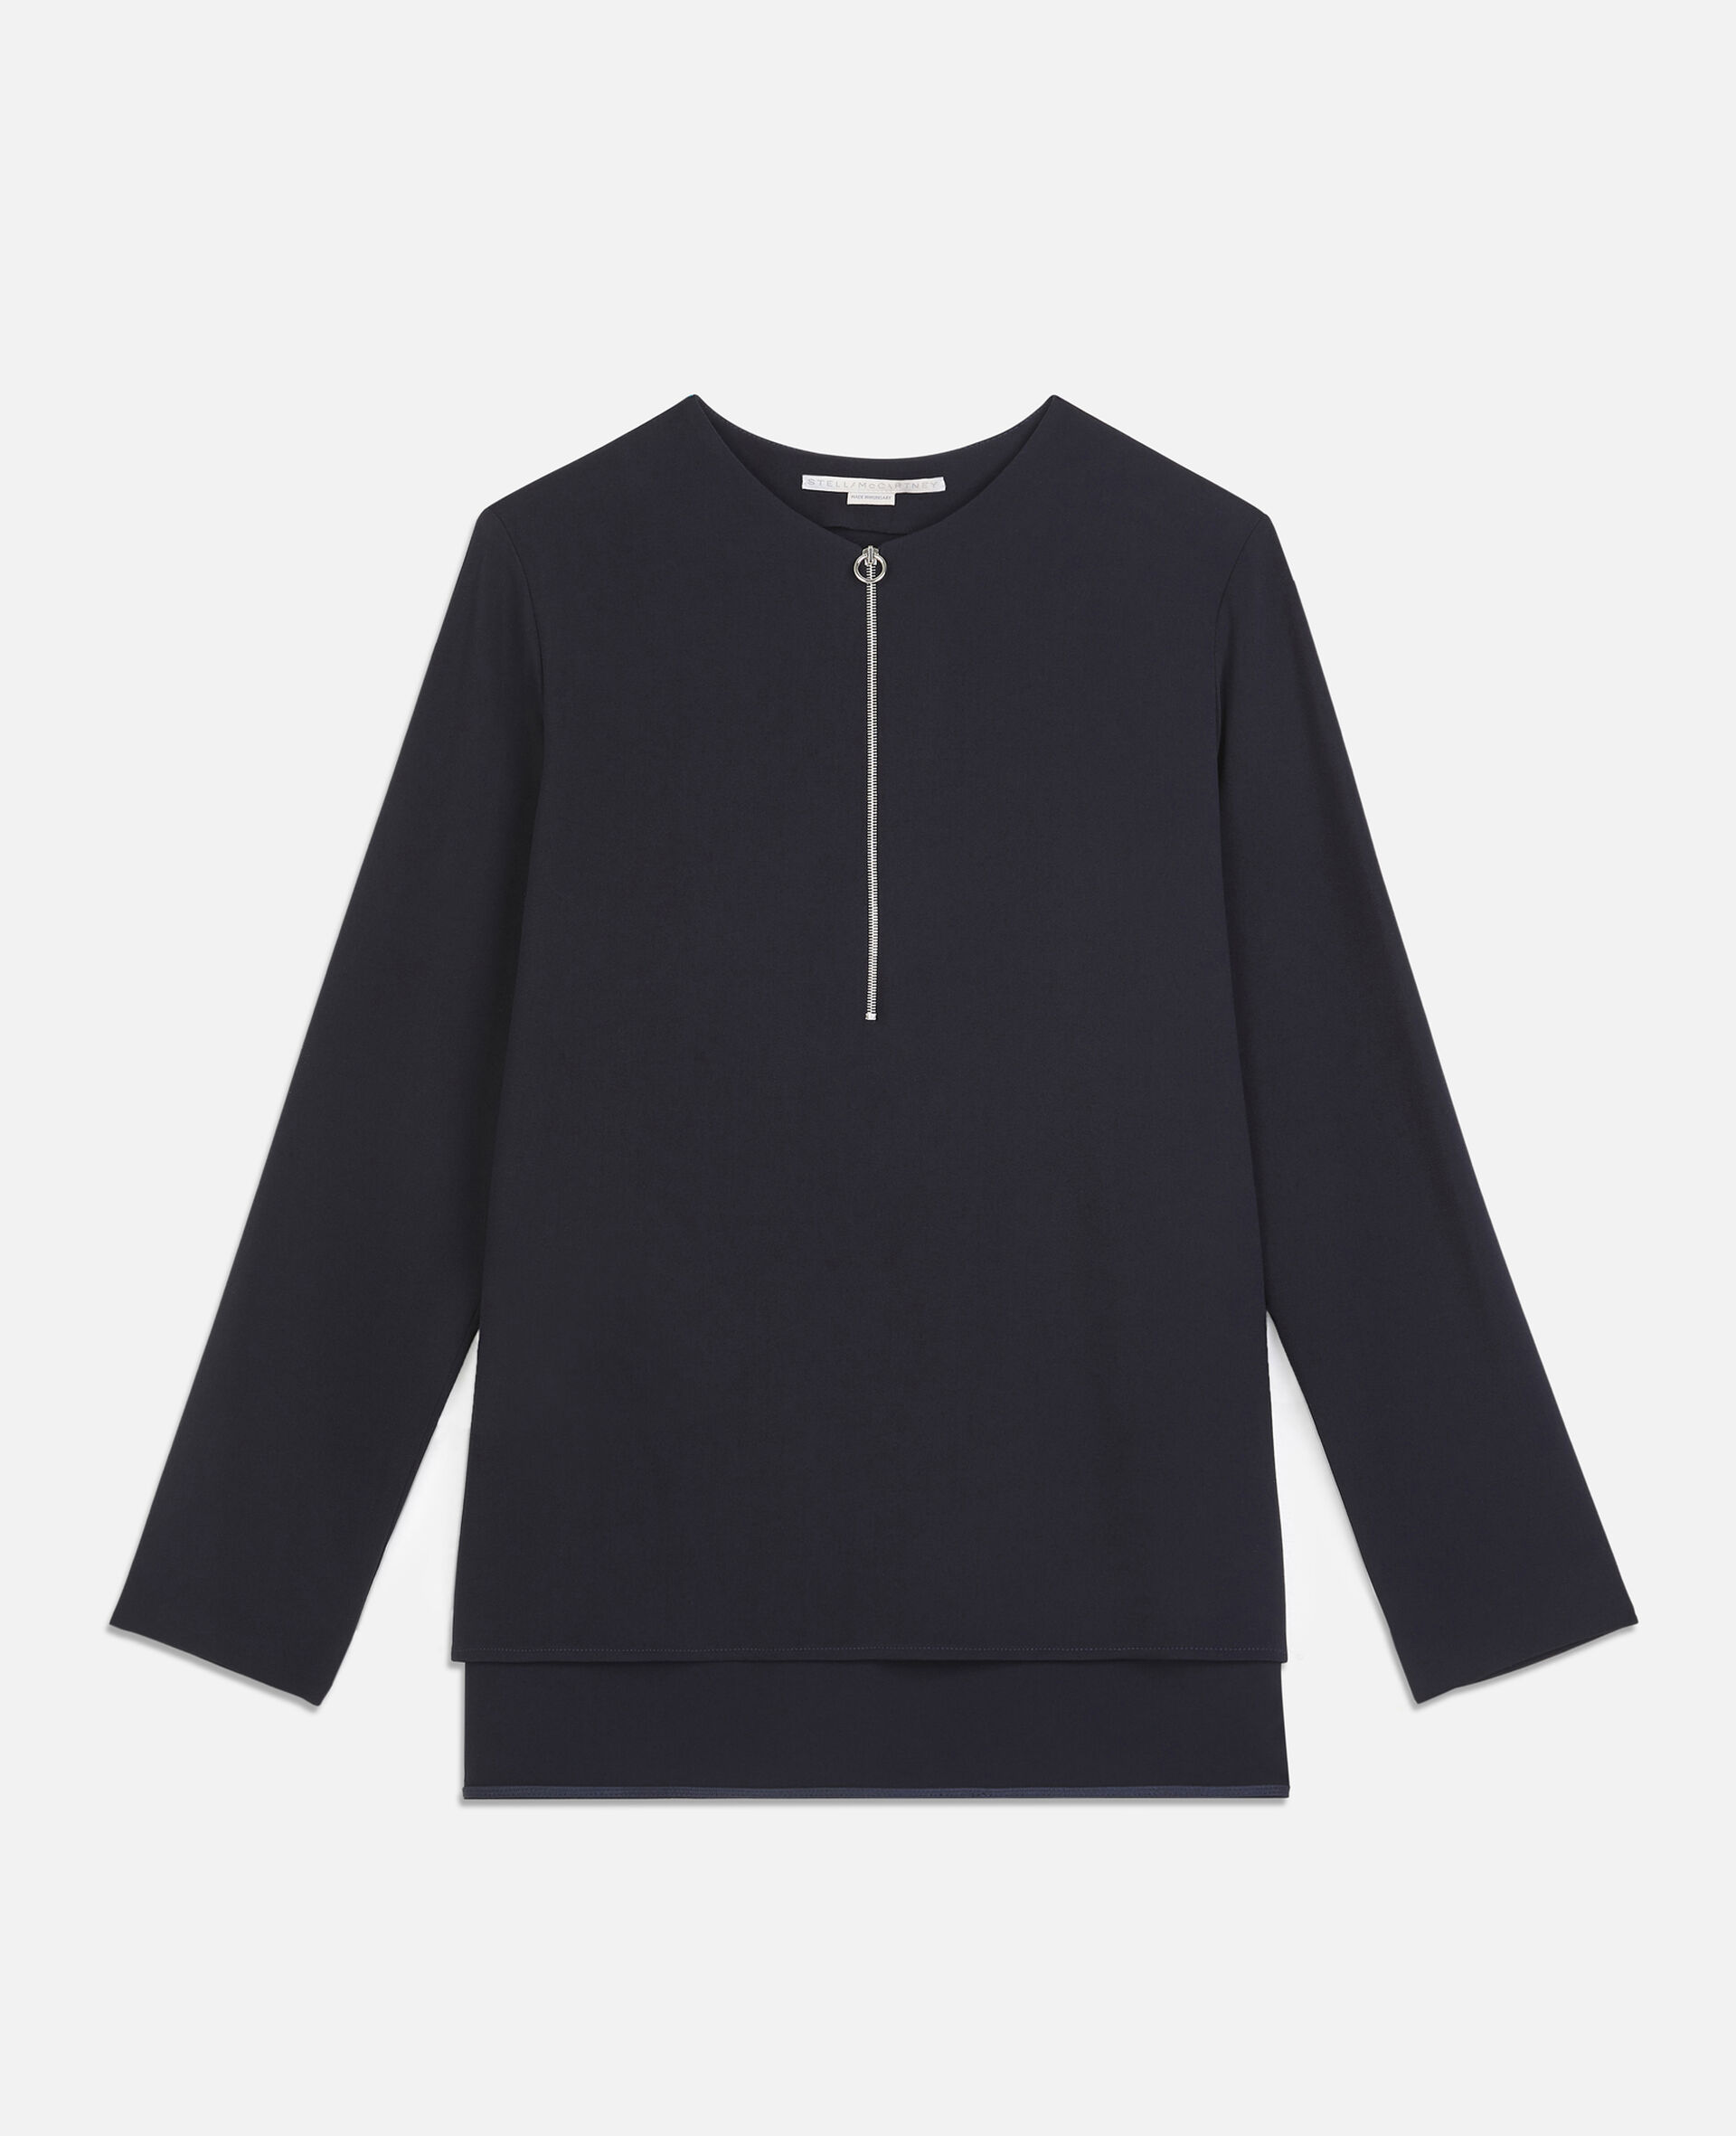 Arlesa 上衣-黑色-large image number 0